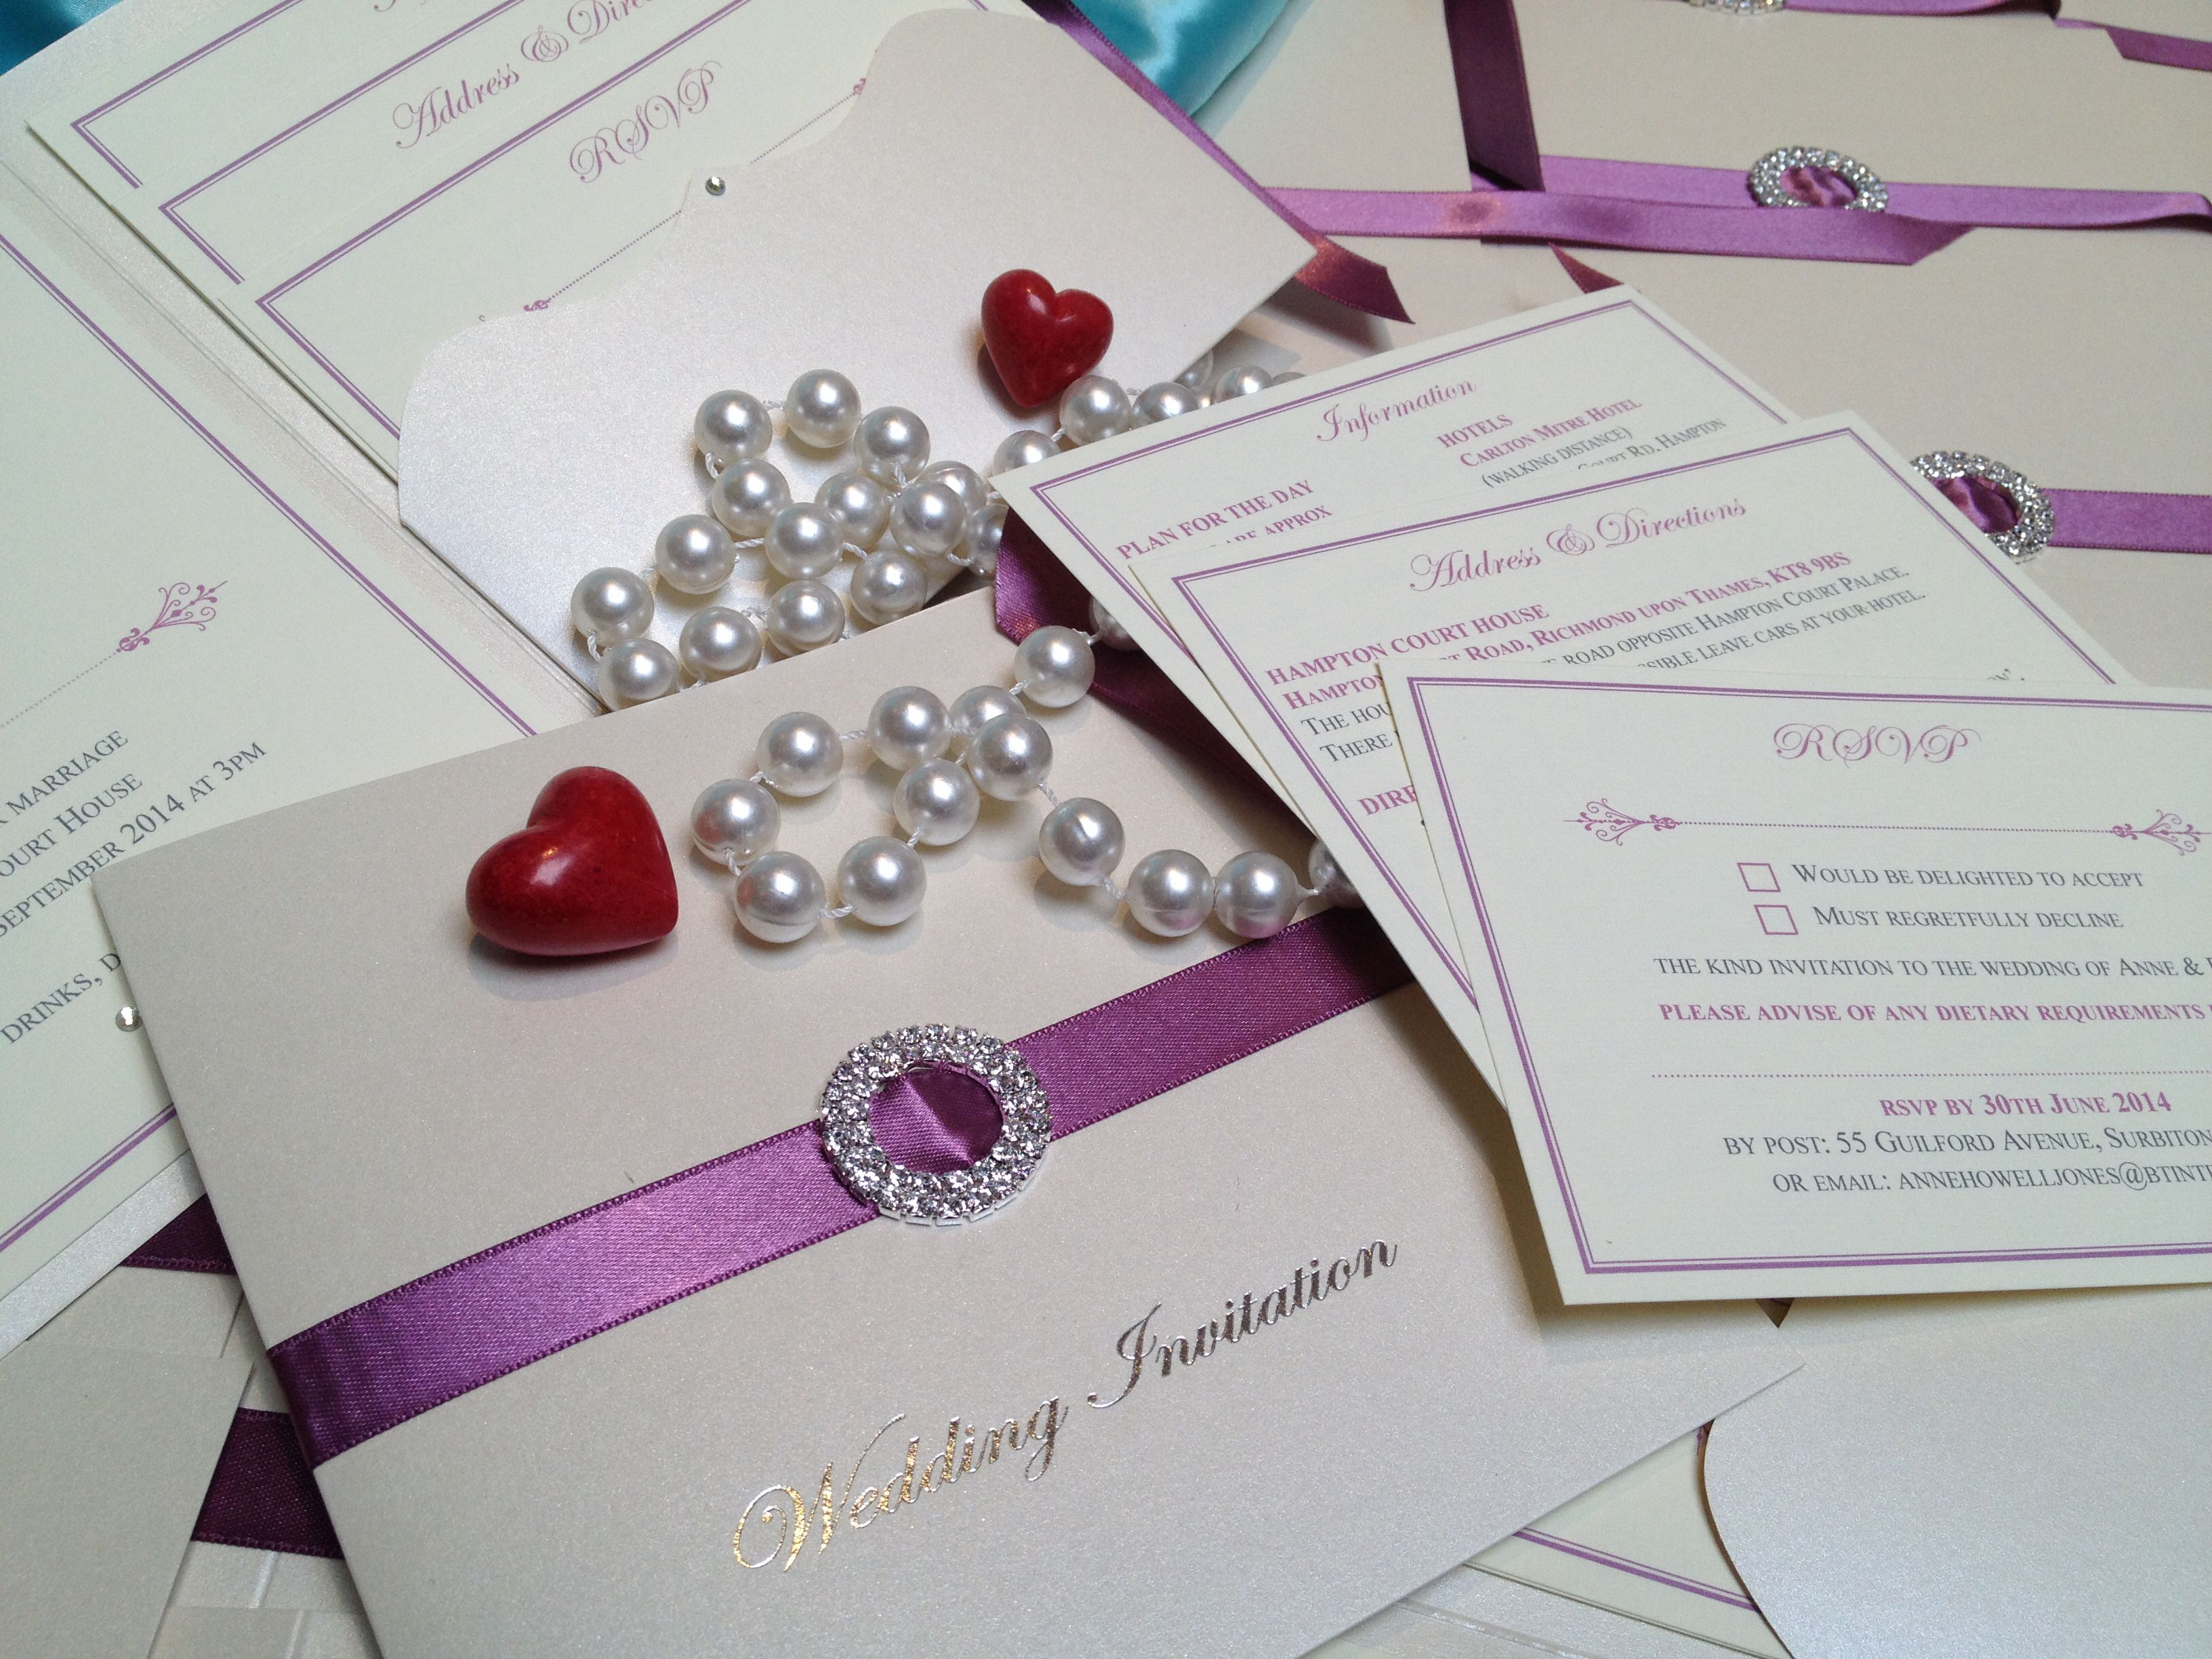 London wedding invitations - handmade luxury bespoke bookfold with ...